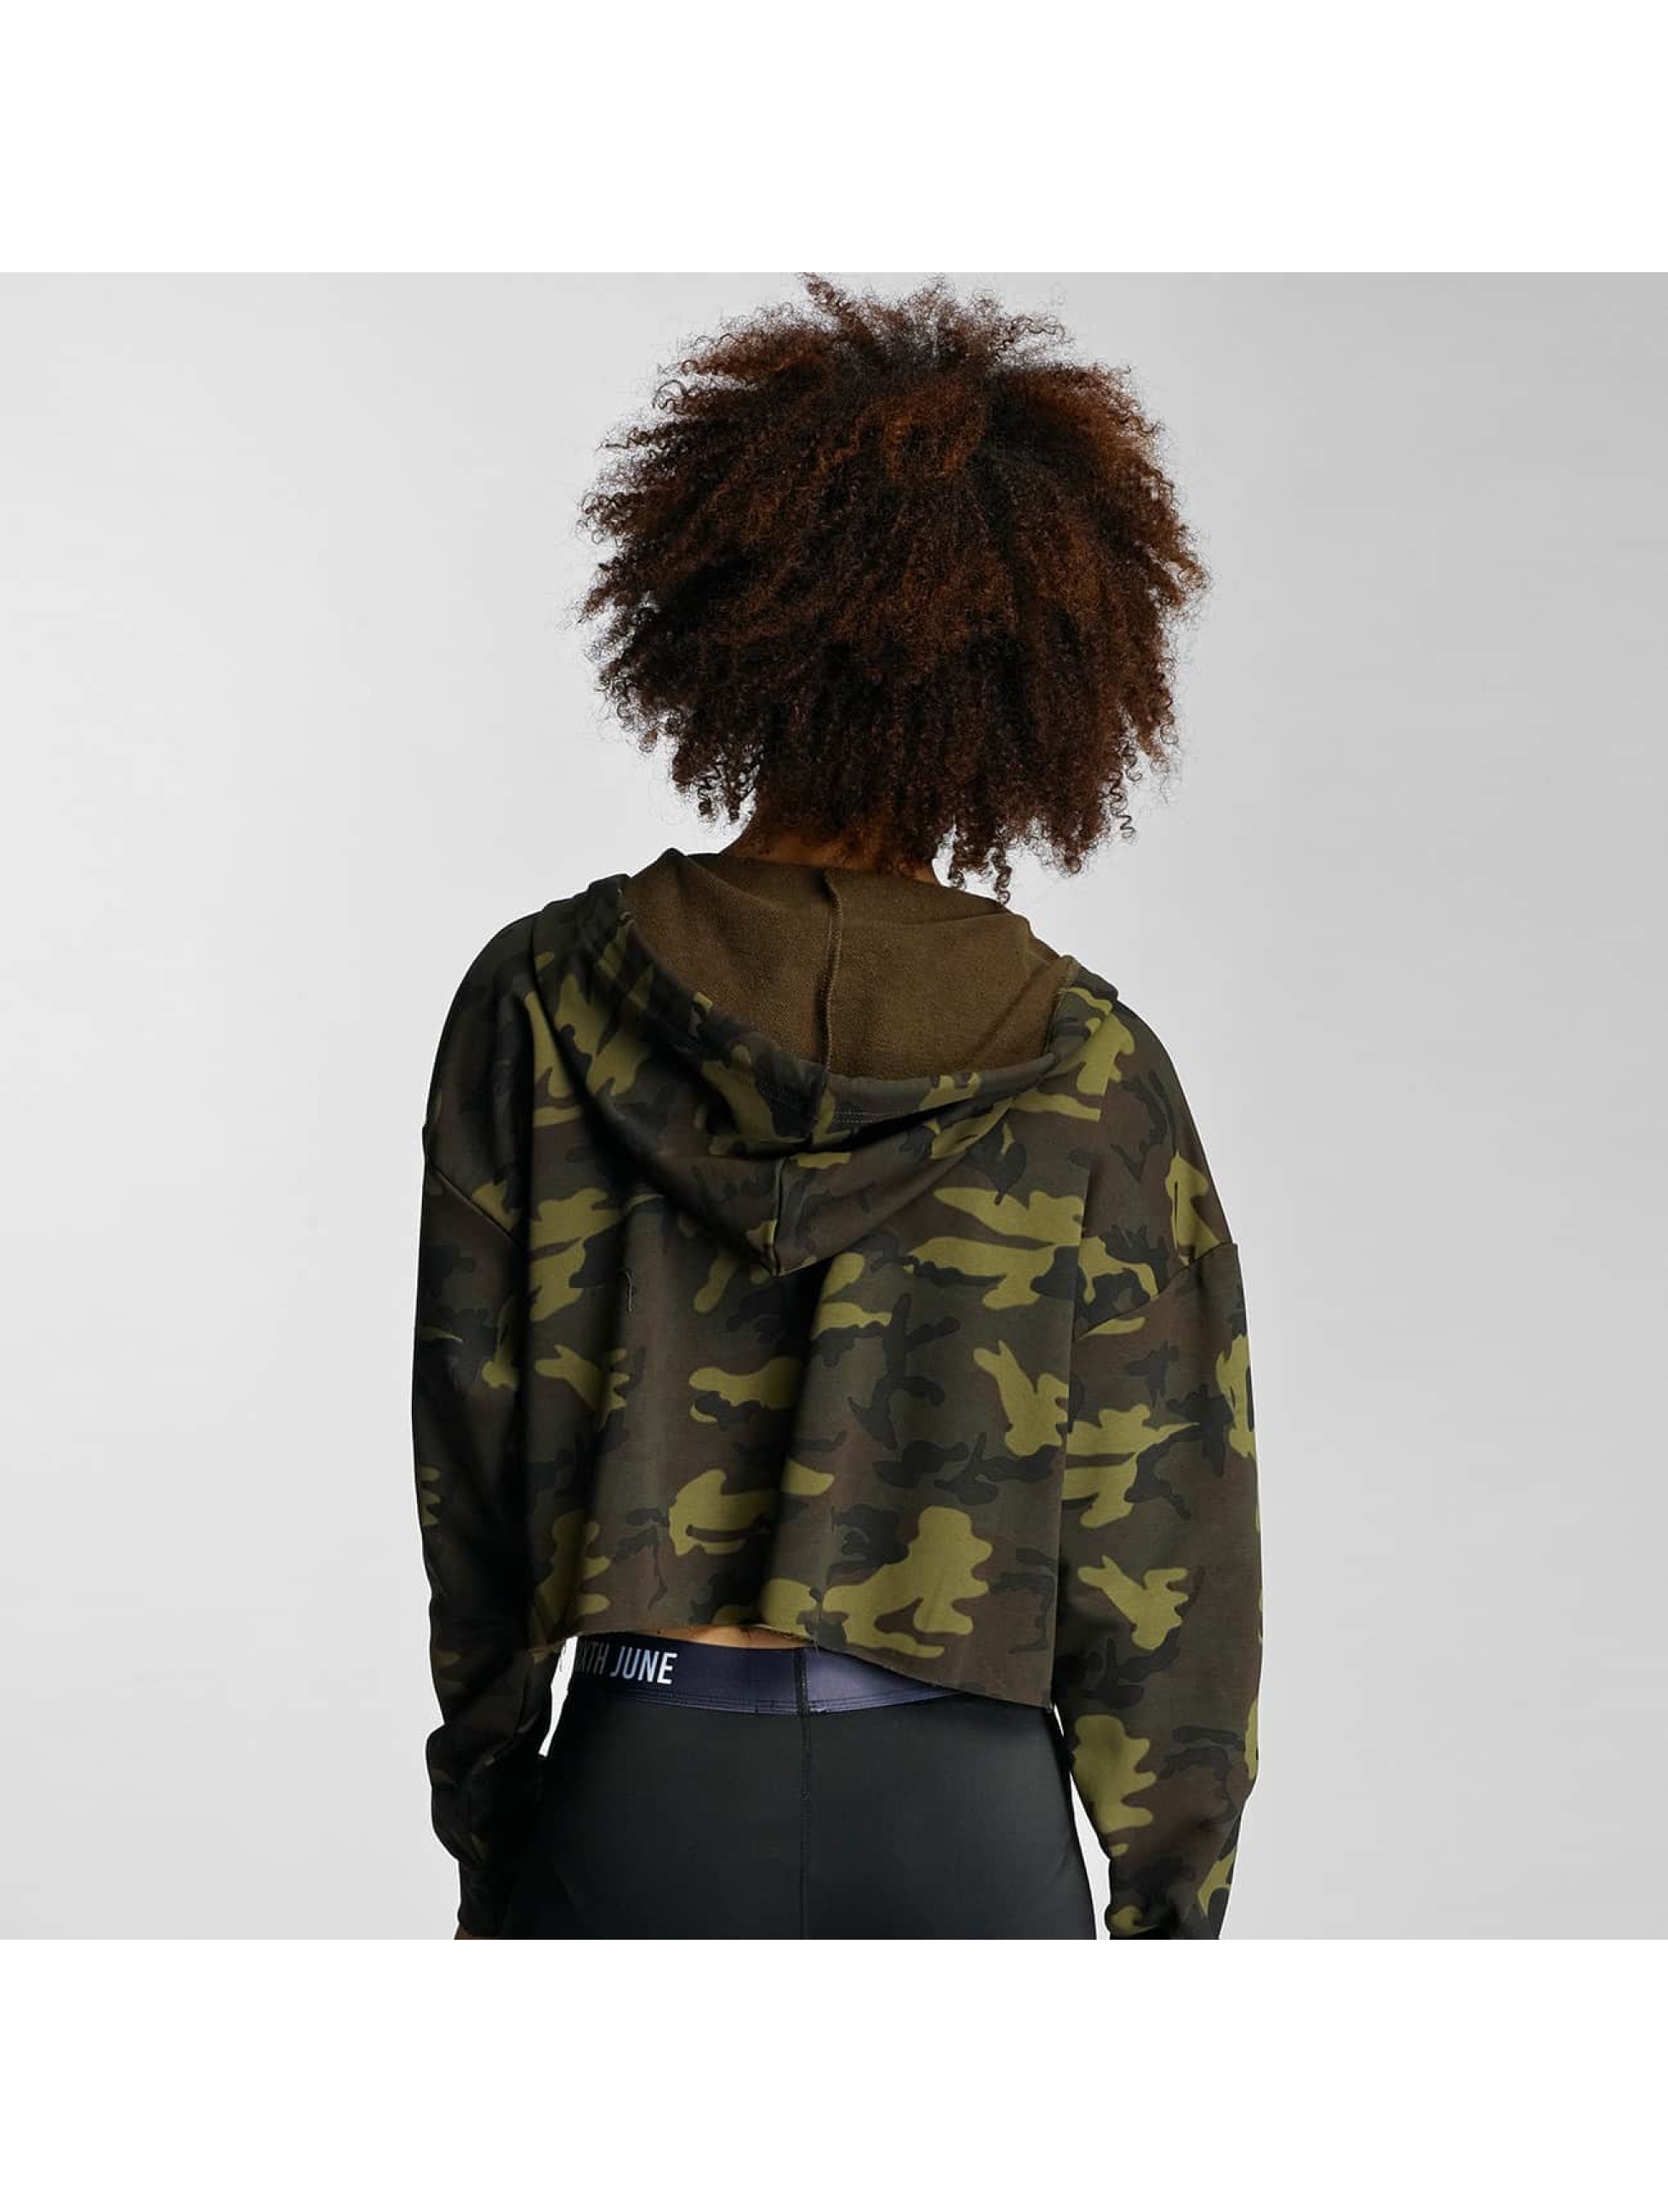 Sixth June Zip Hoodie Oversized kamouflage